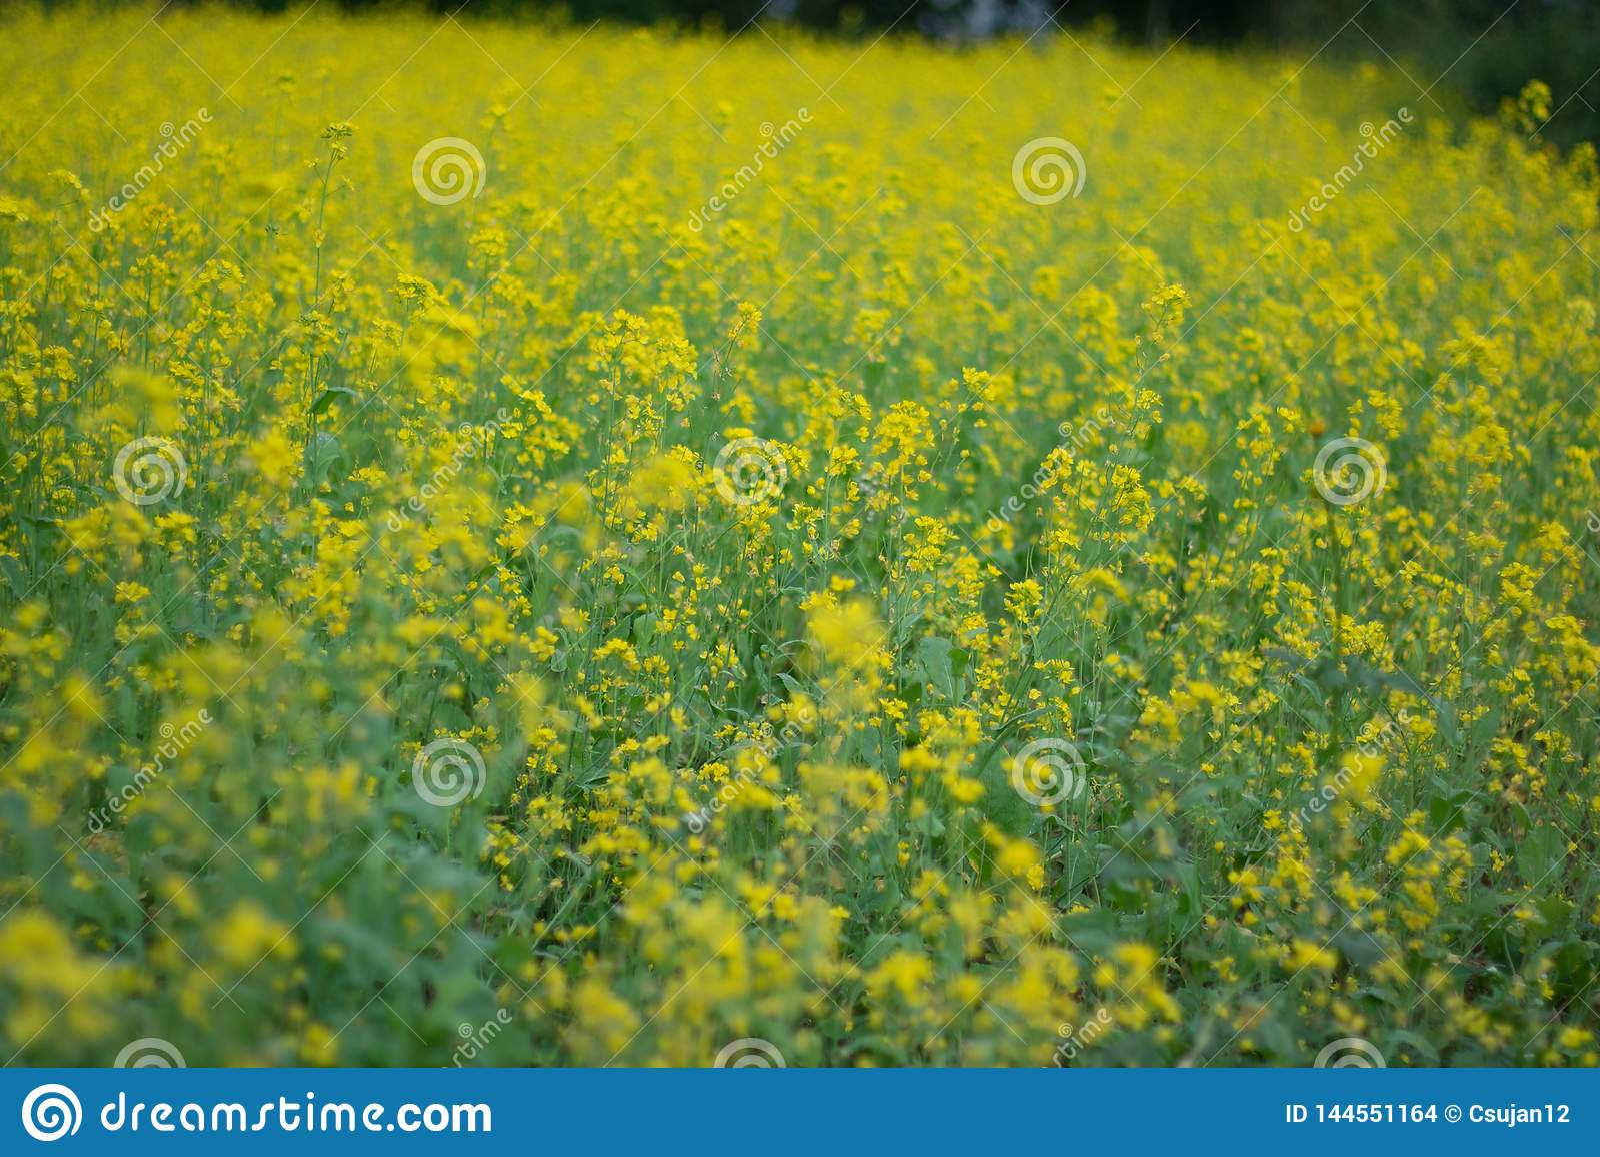 Mustard plant in spring